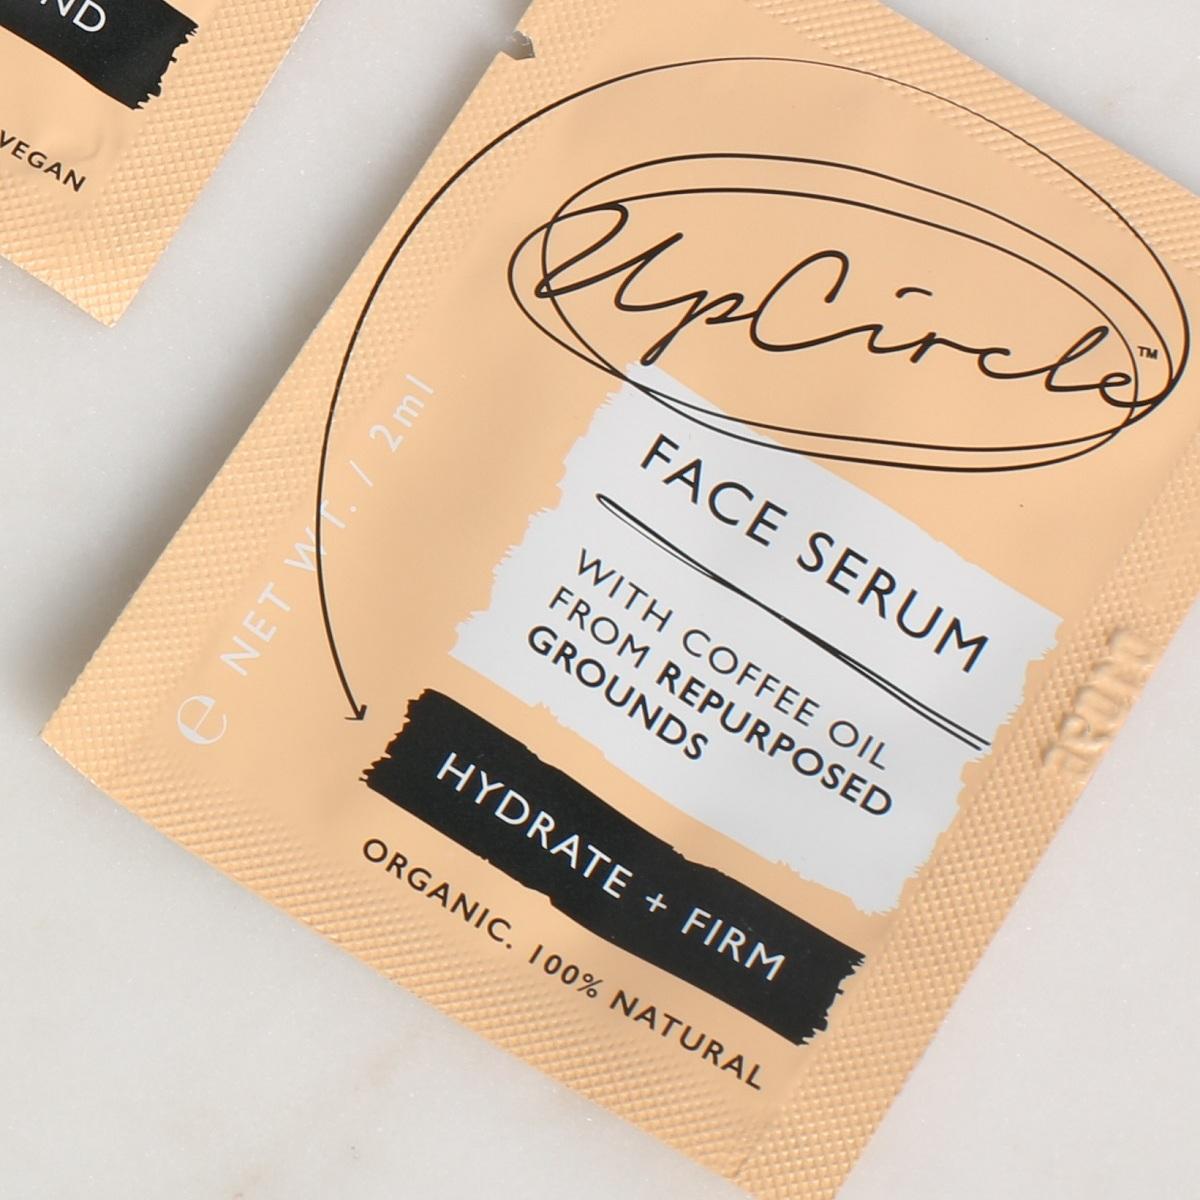 Upcircle Coffee Face Serum.jpg